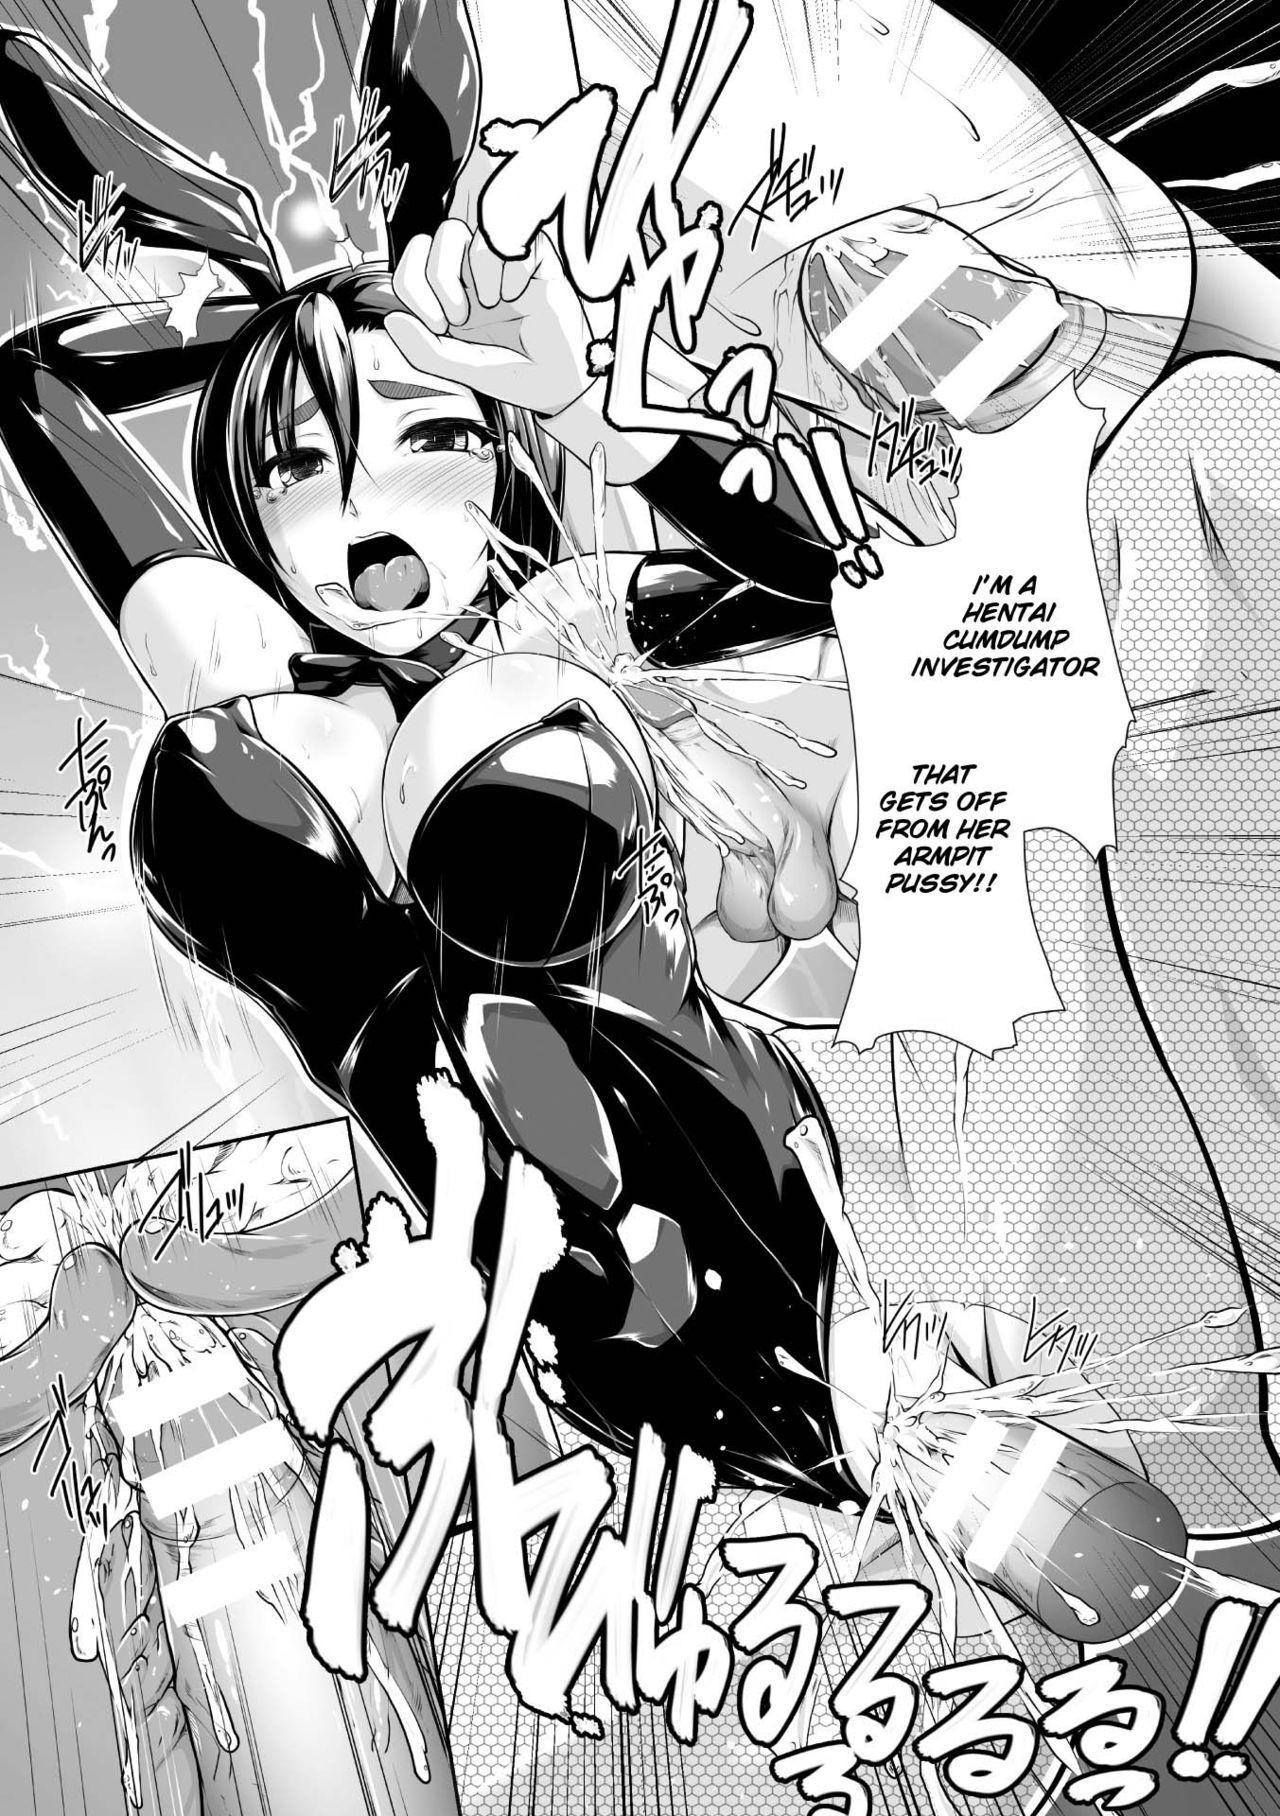 2D Comic Magazine Waki Fechi Bunny Girl Vol.1 Ch 1-3 22